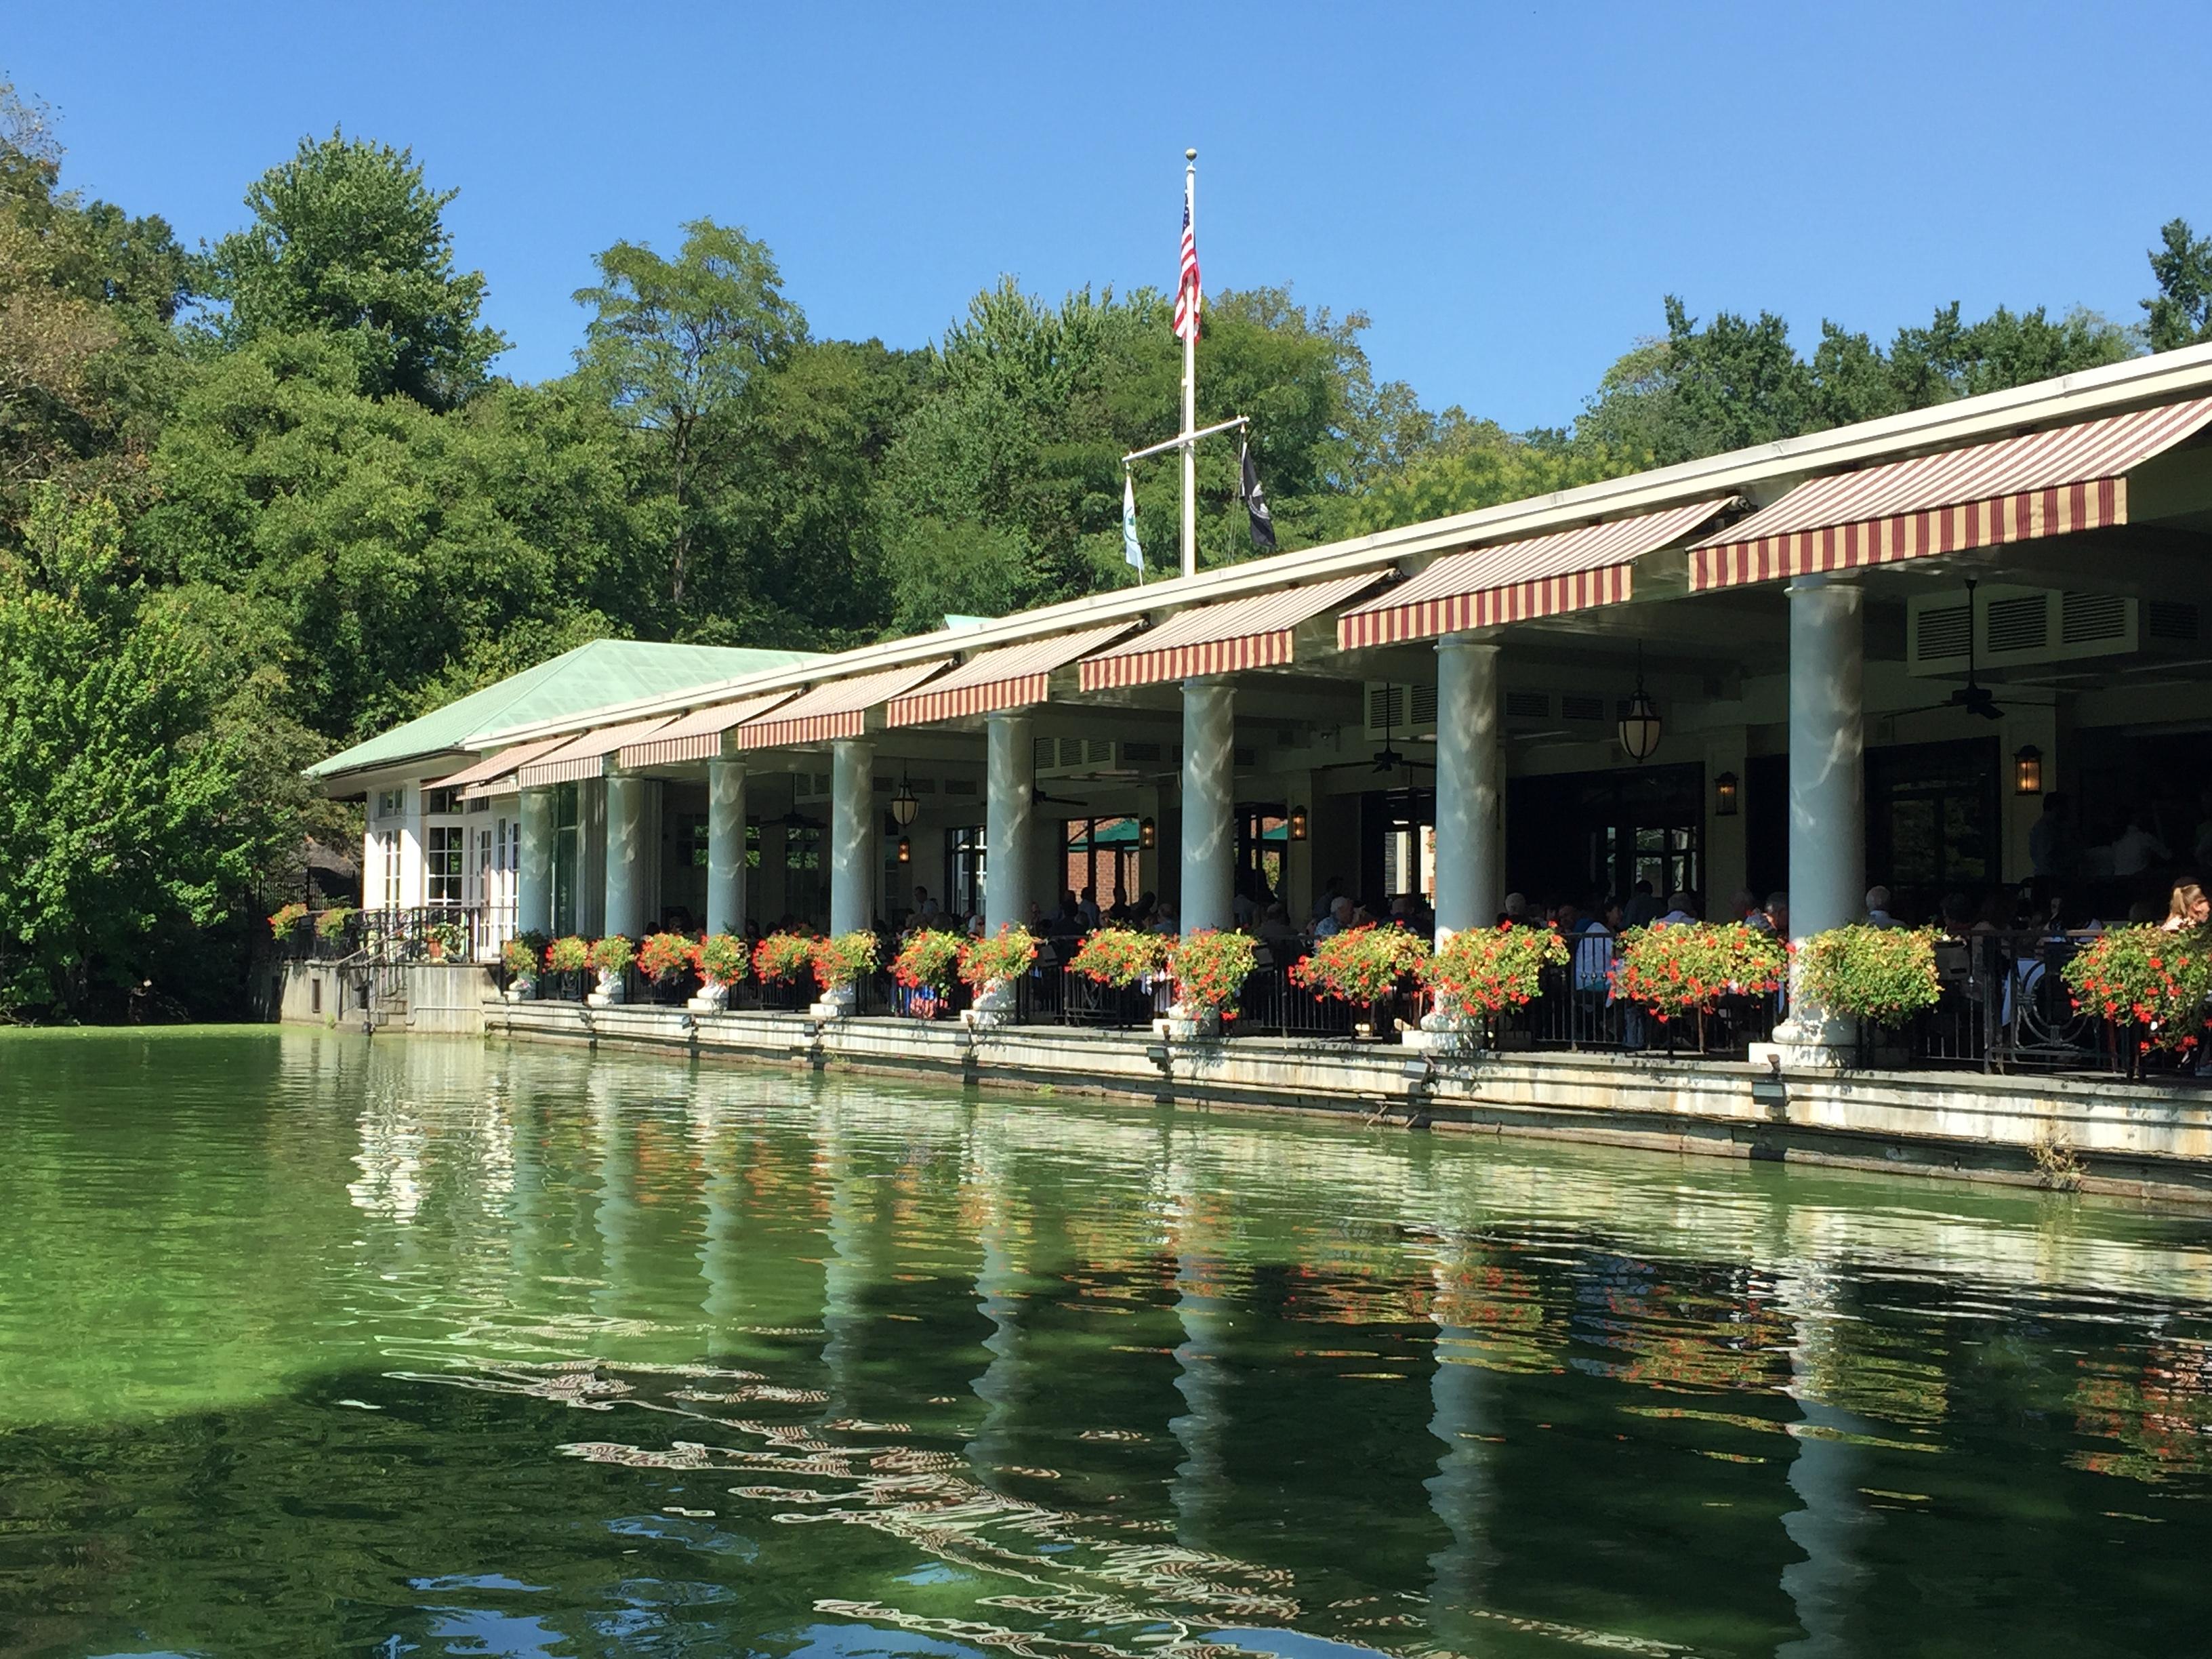 5. Loeb Boathouse Central Park